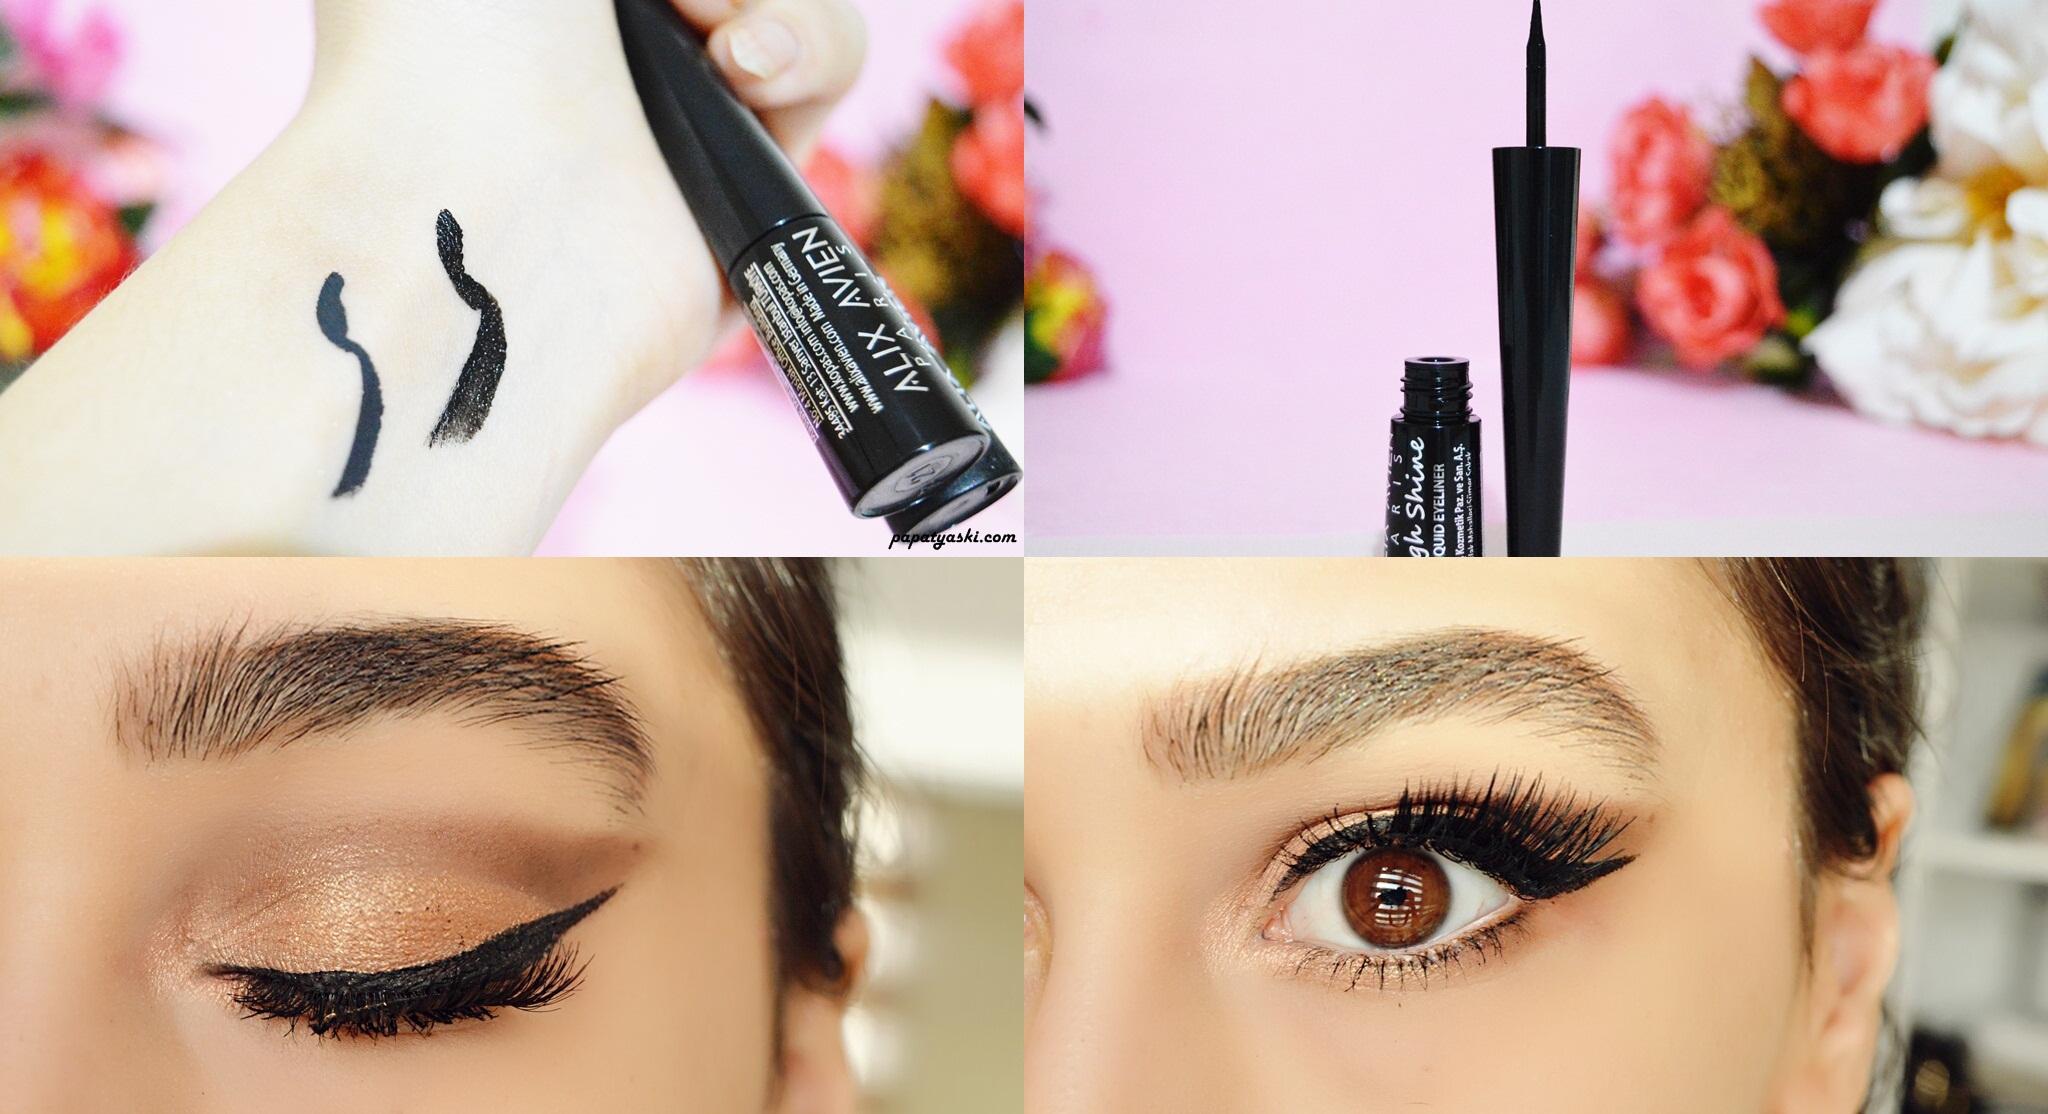 alix-avien-eyeliner-kullananlar-tile